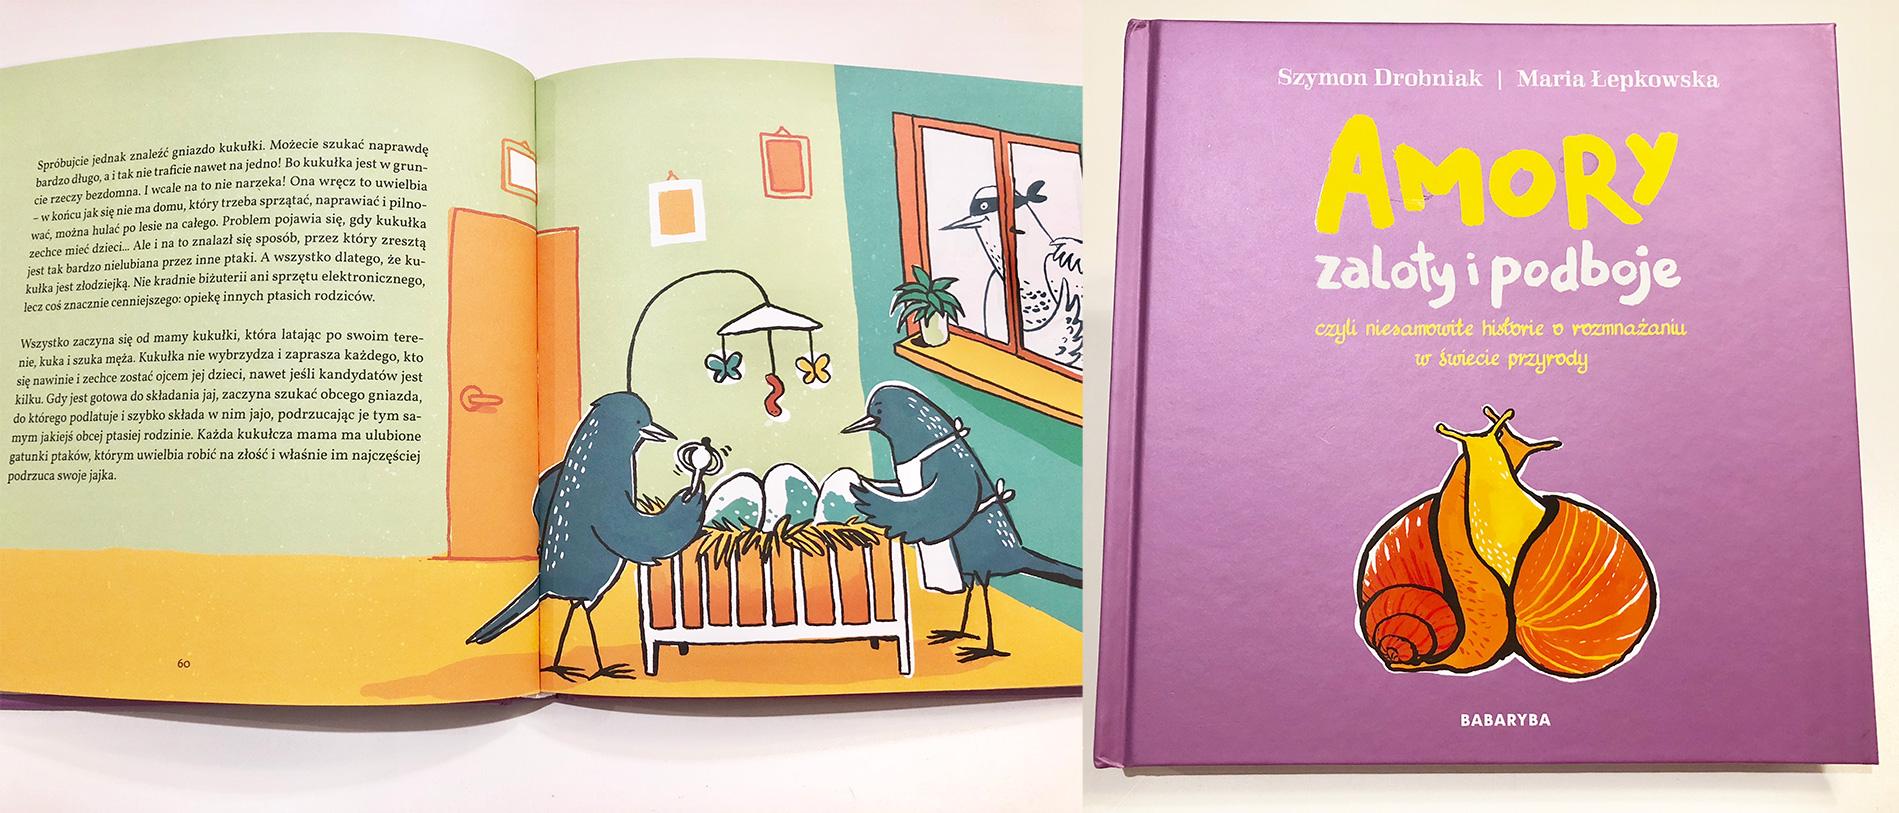 Amory, zaloty i podboje - wydawnictwo Babaryba - cena 42 PLN